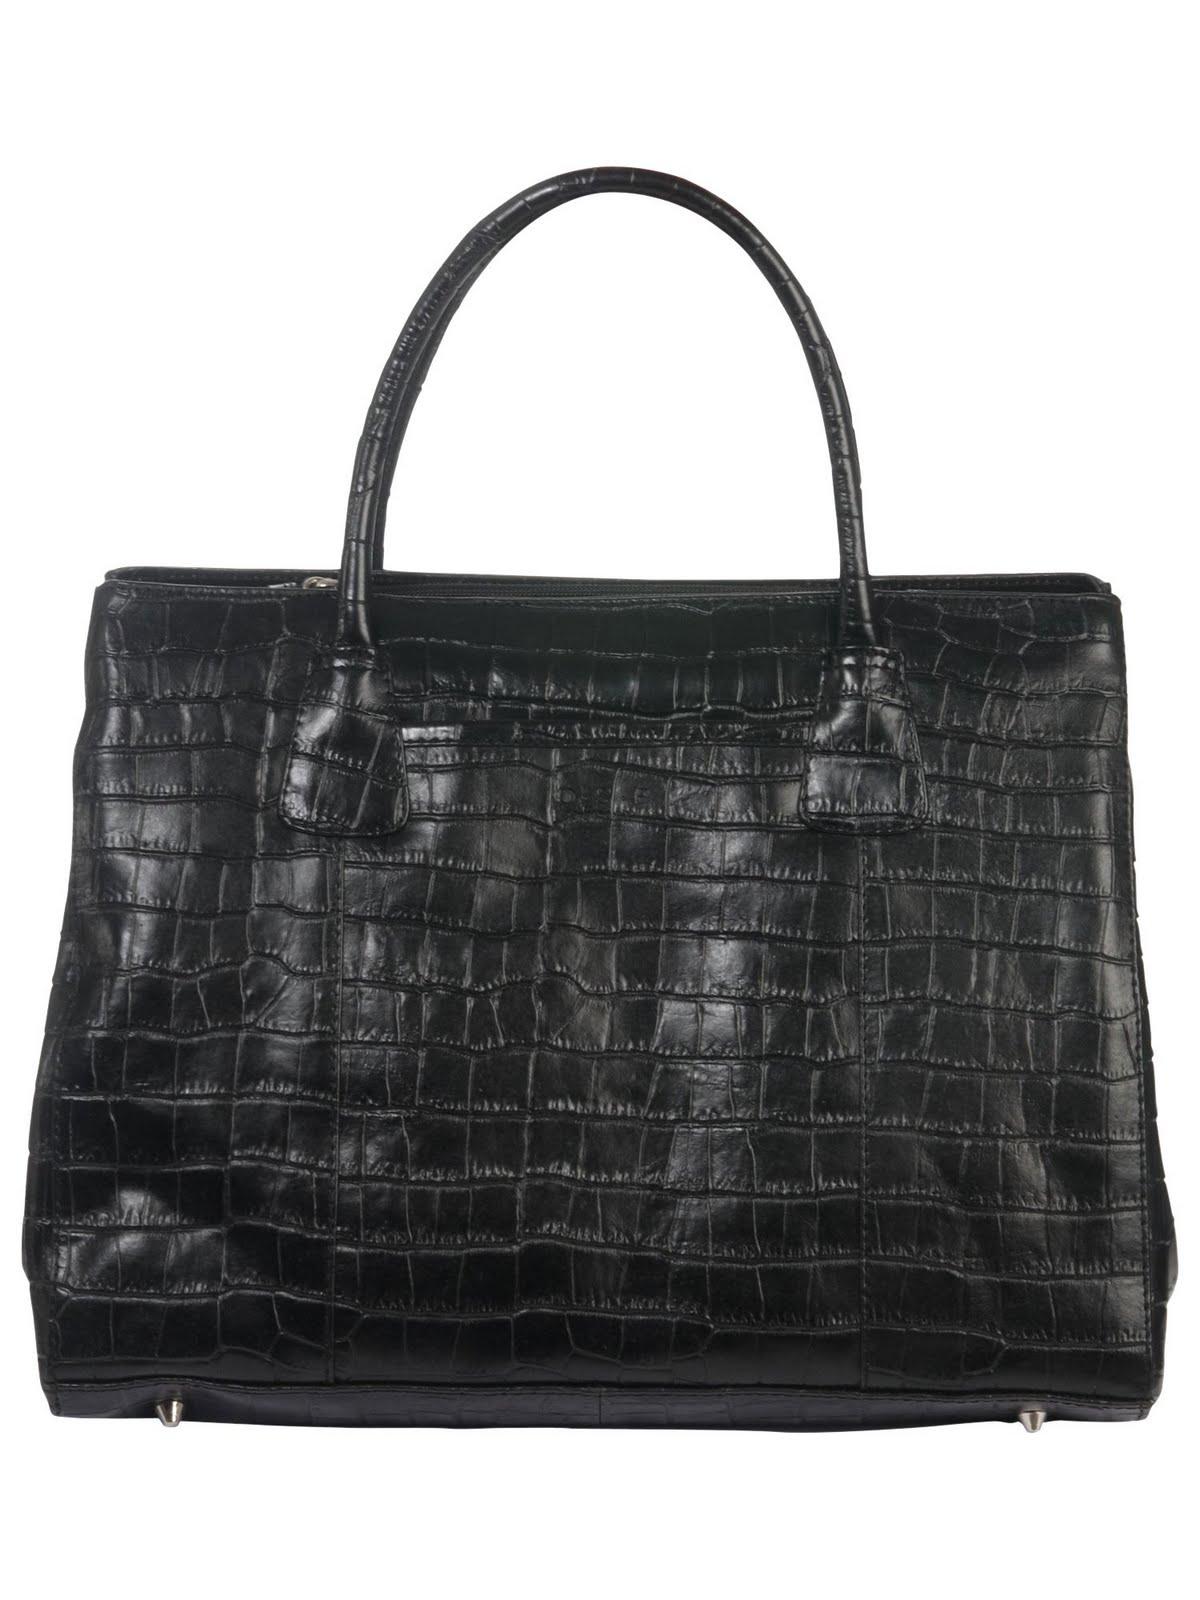 Osprey Handbags Asheclub Blogspot Com